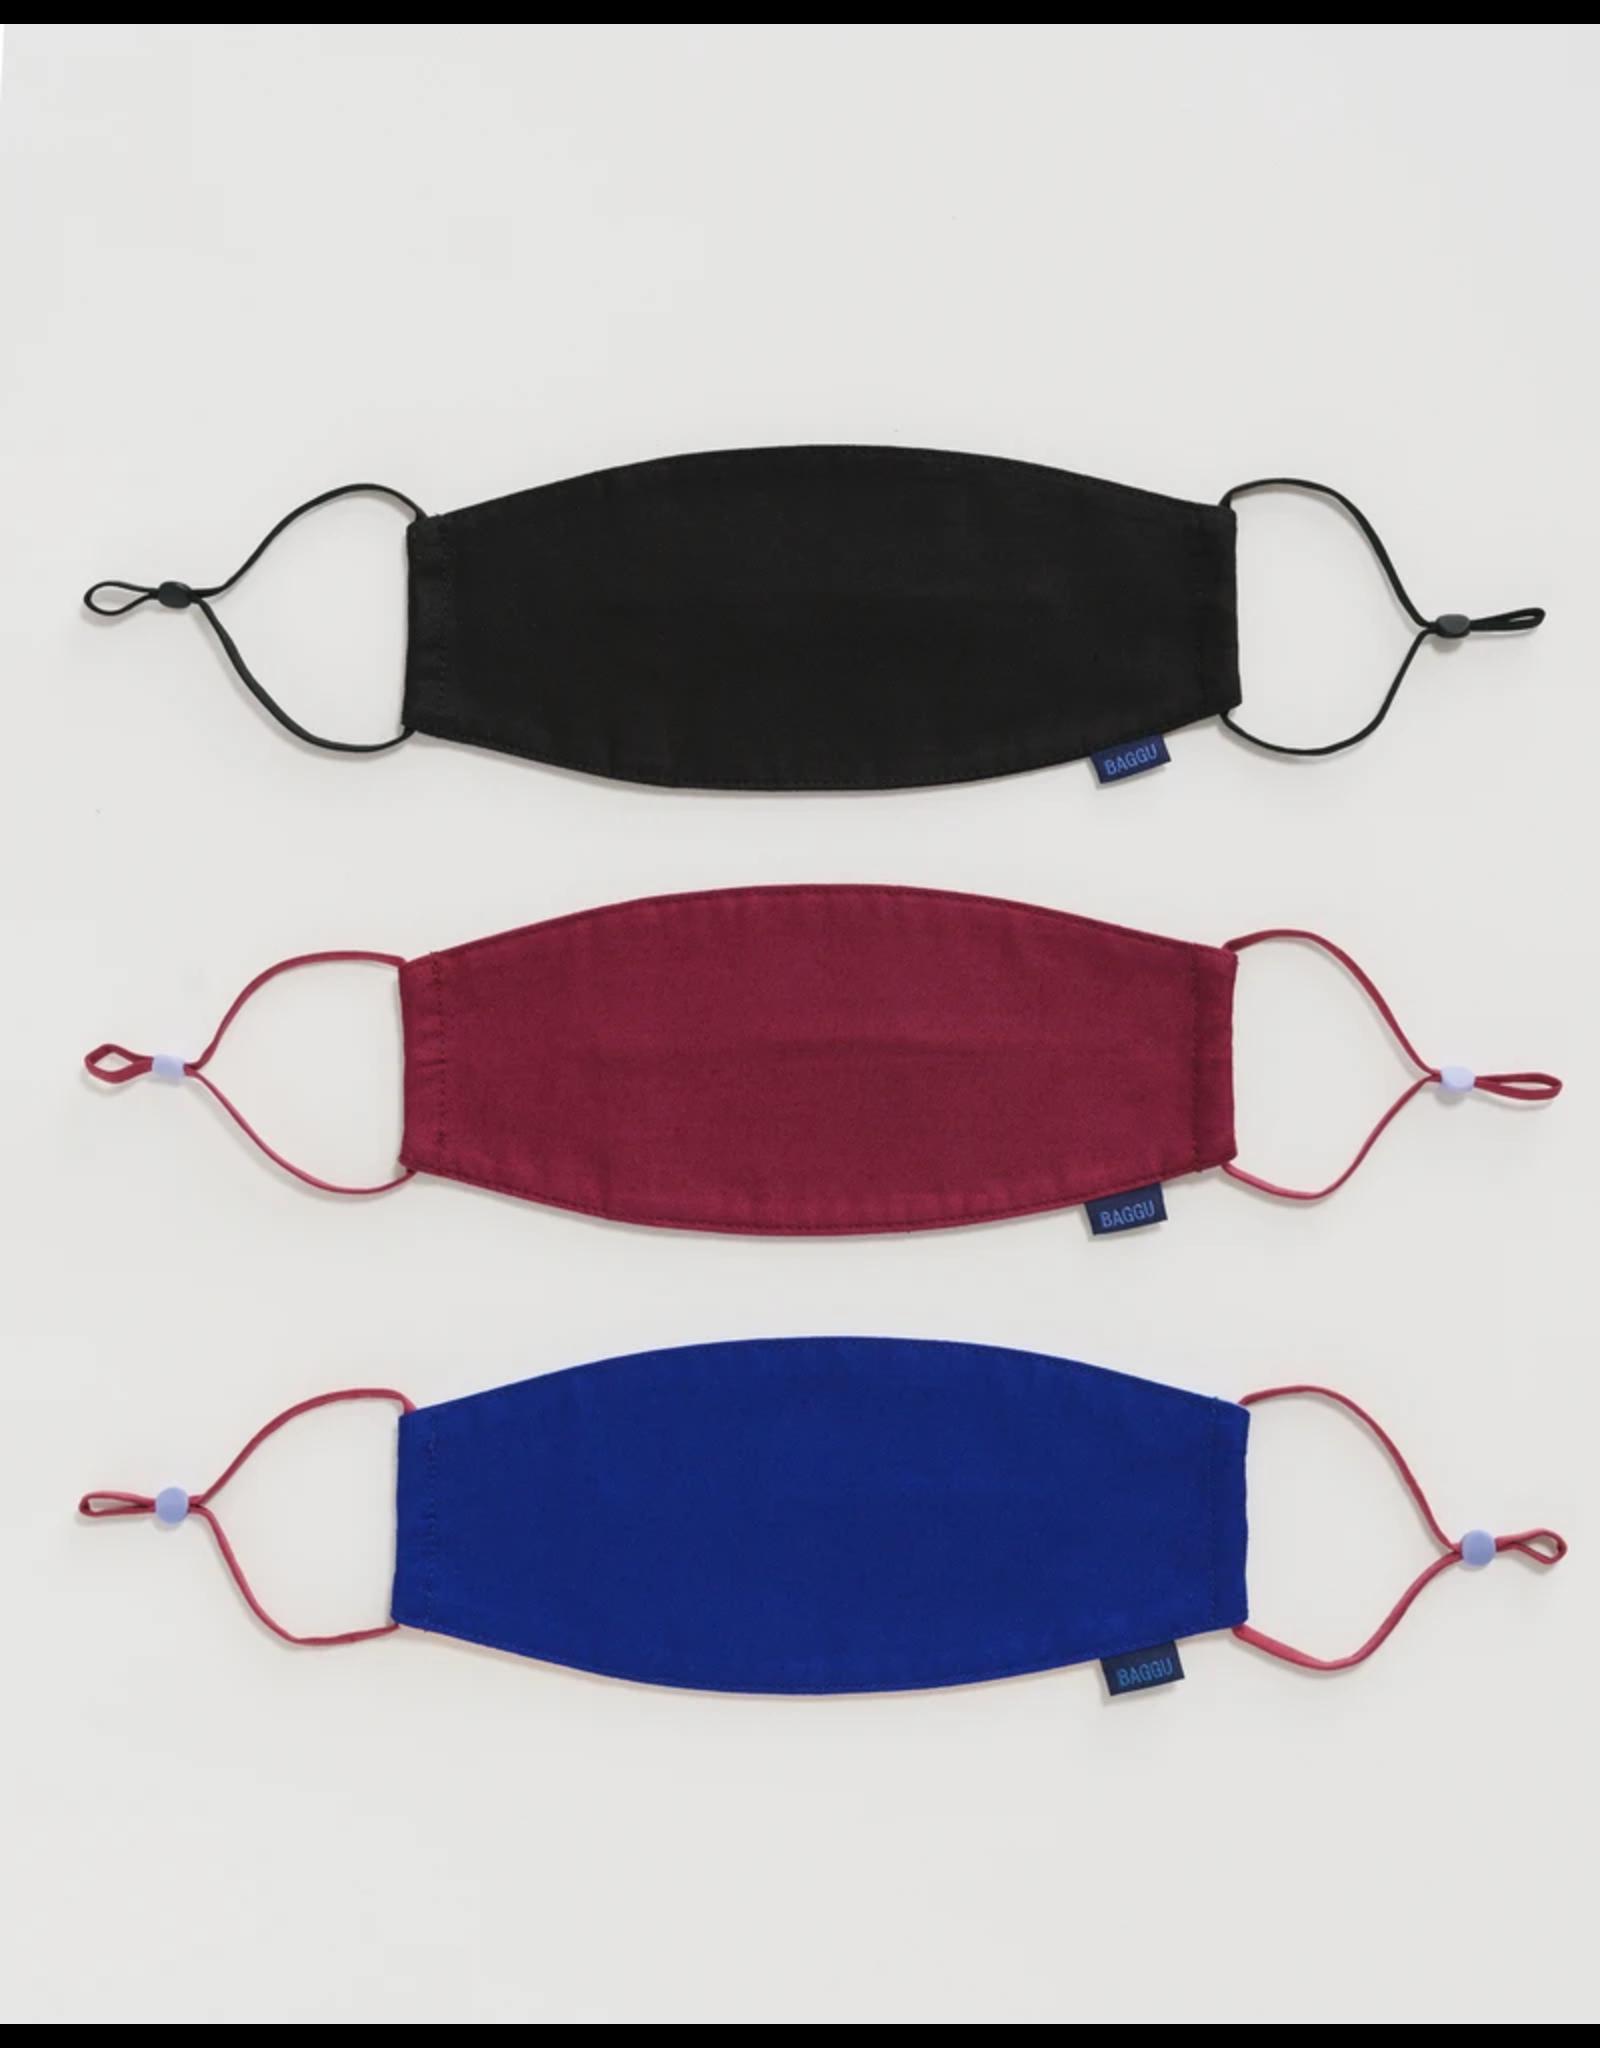 Baggu Baggu Fabric Mask Set - Twilight